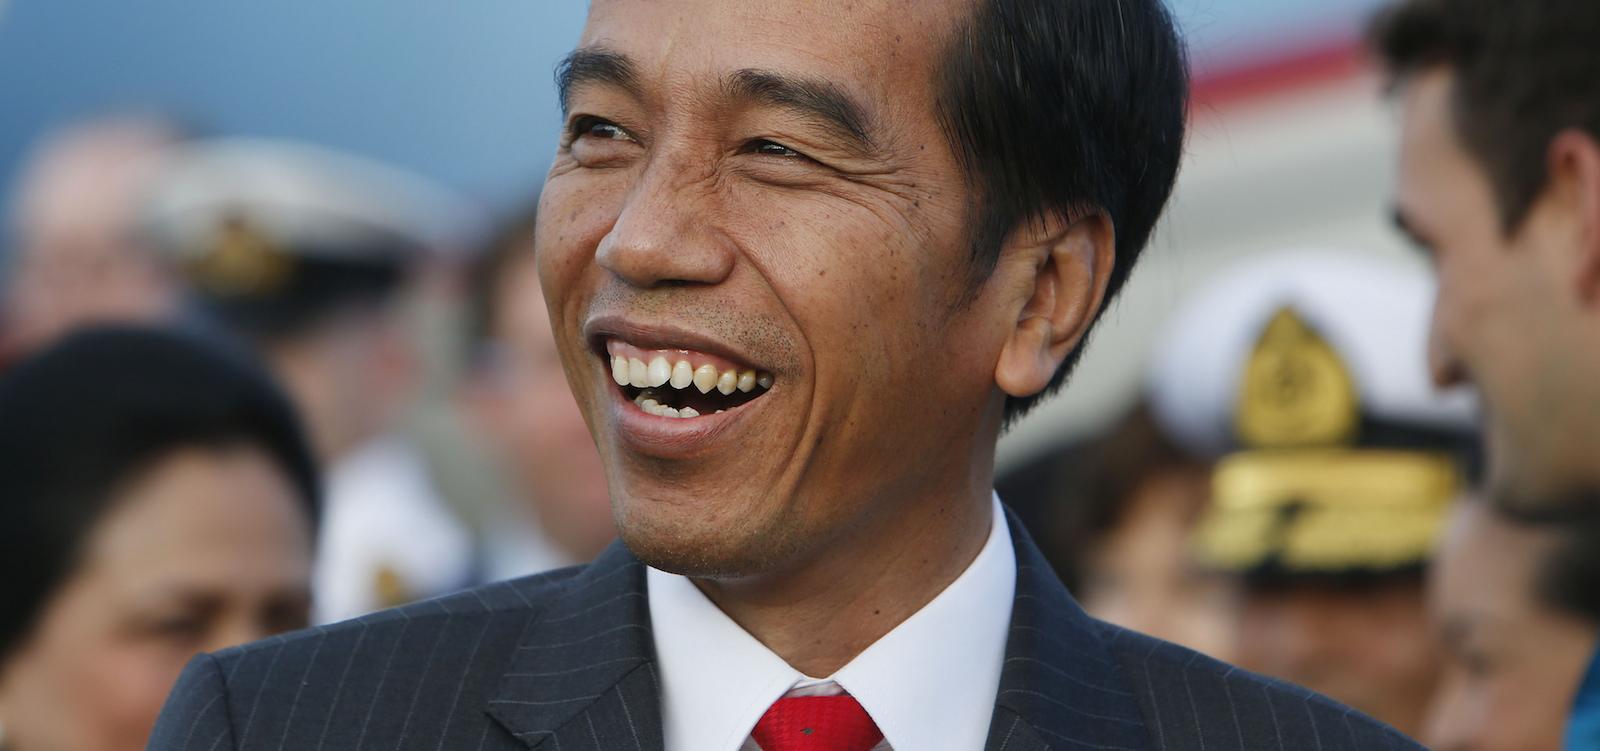 Indonesian President Joko Widodo in Sydney in March (Photo: aseaninaus/Flickr)